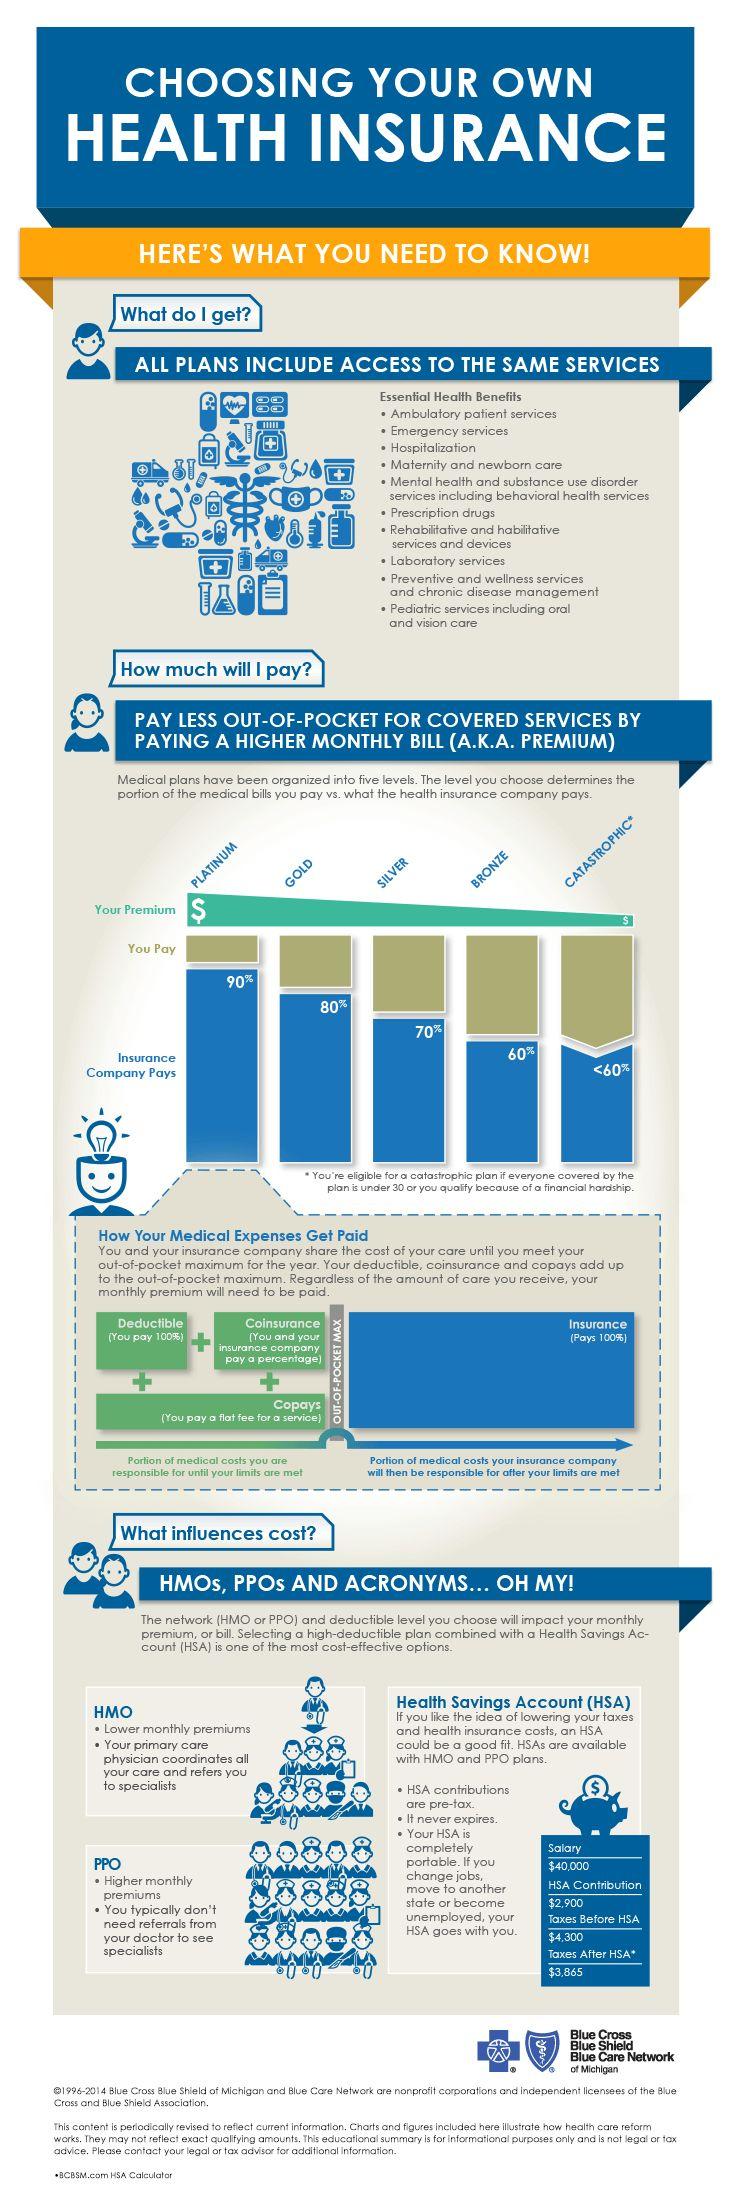 Choosing your own health insurance health insurance 101